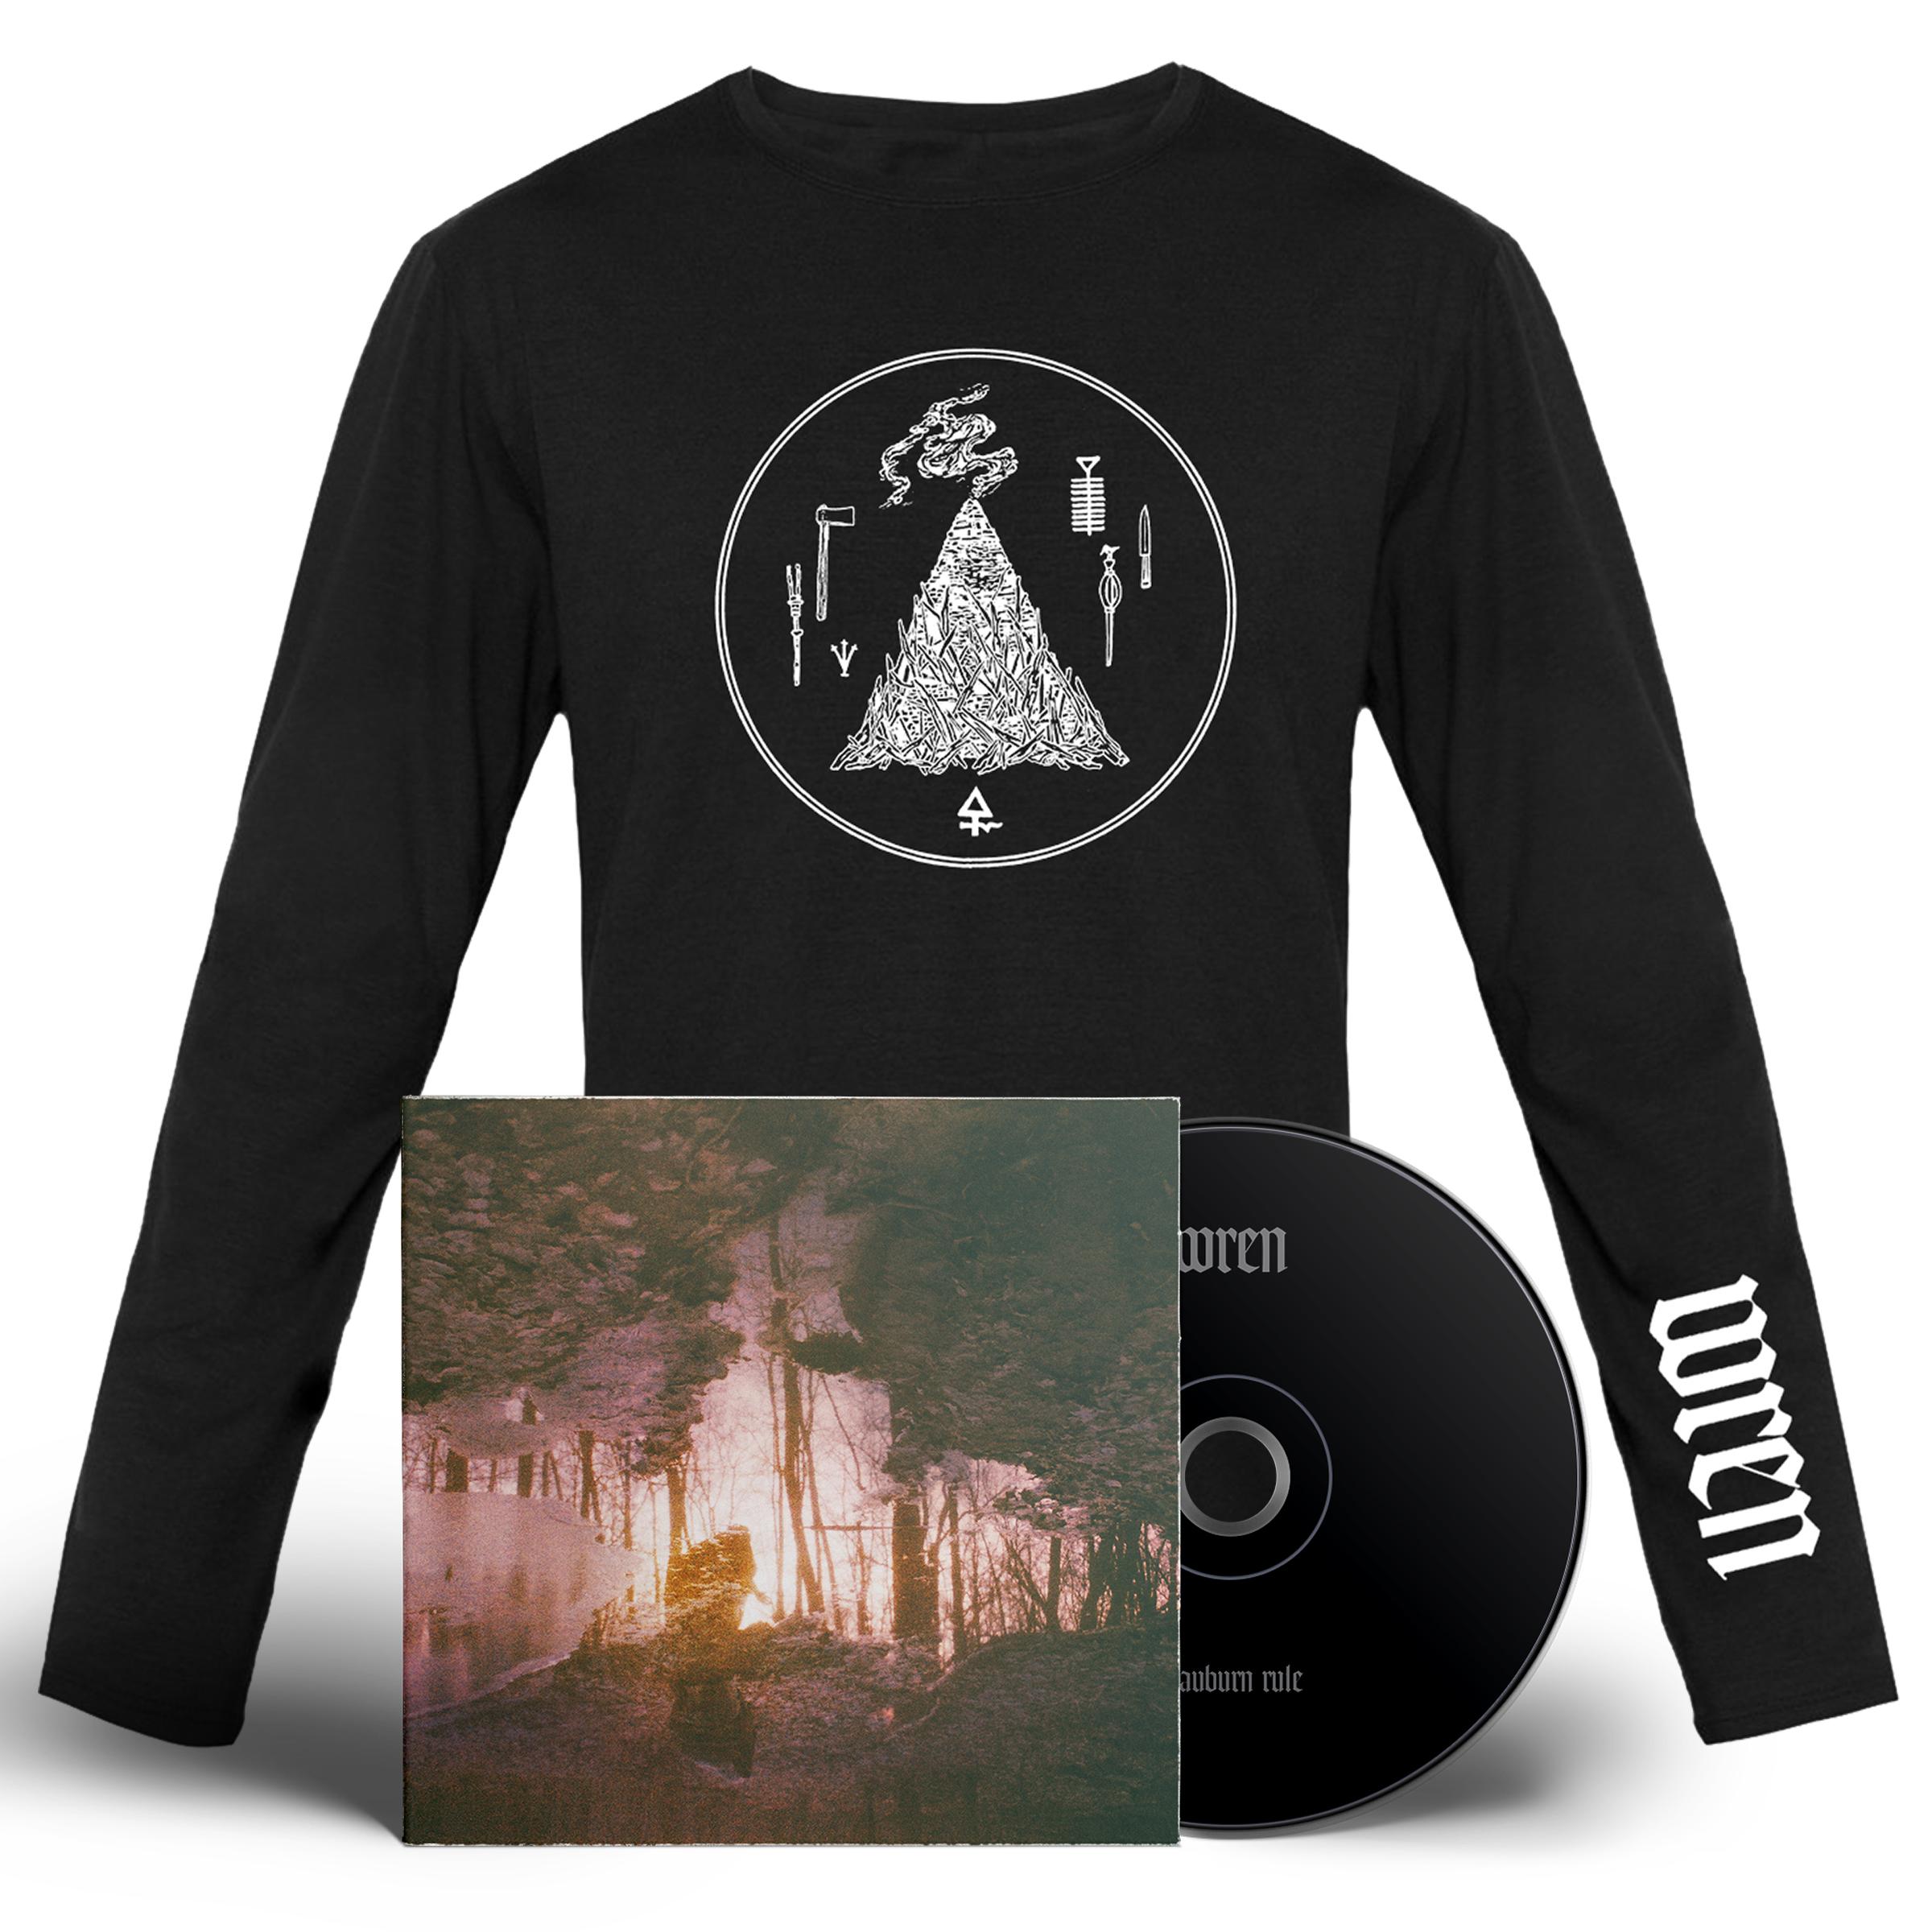 Wren - Auburn Rule CD + long sleeve